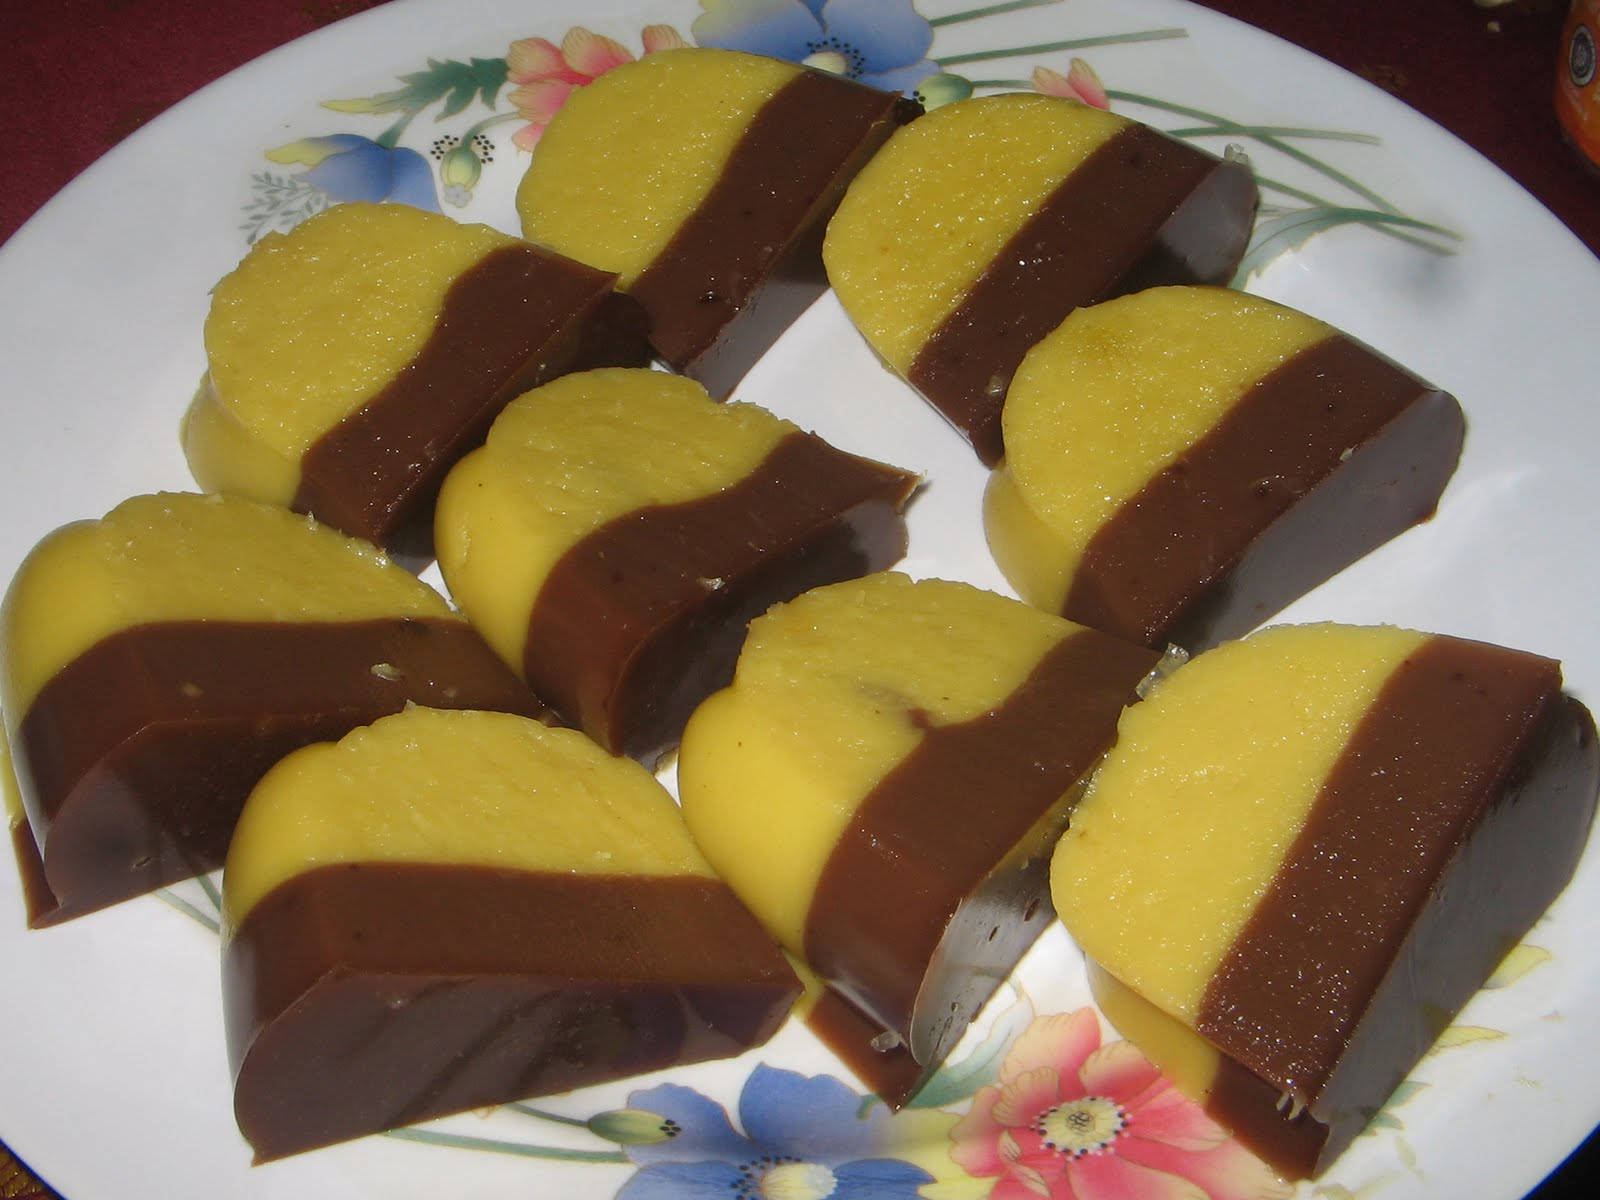 Resep Puding Coklat http://asri78.wordpress.com/2012/05/02/puding ...